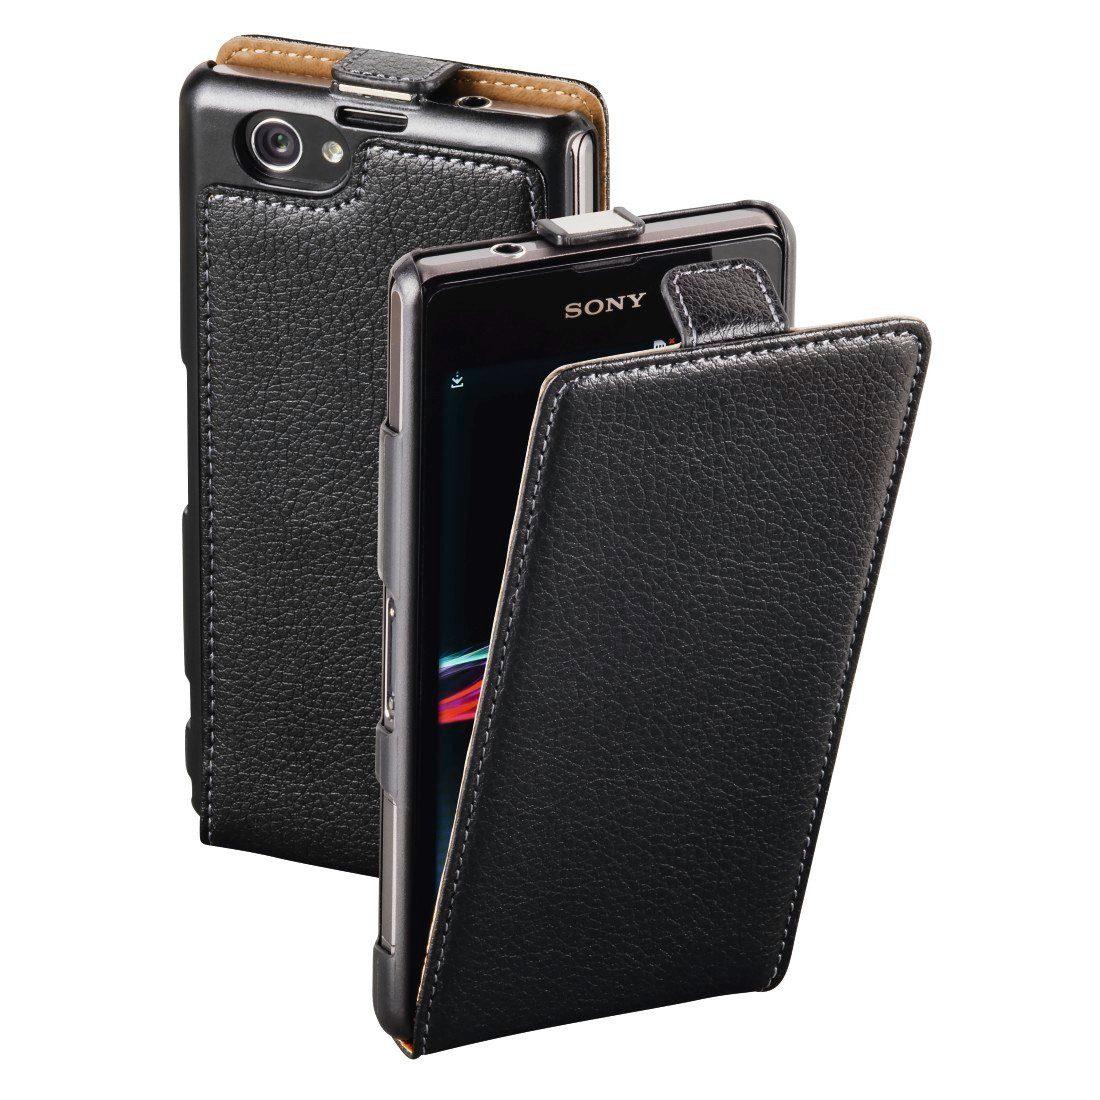 Hama Flap-Tasche Smart Case für Sony Xperia Z1 Compact, Schwarz